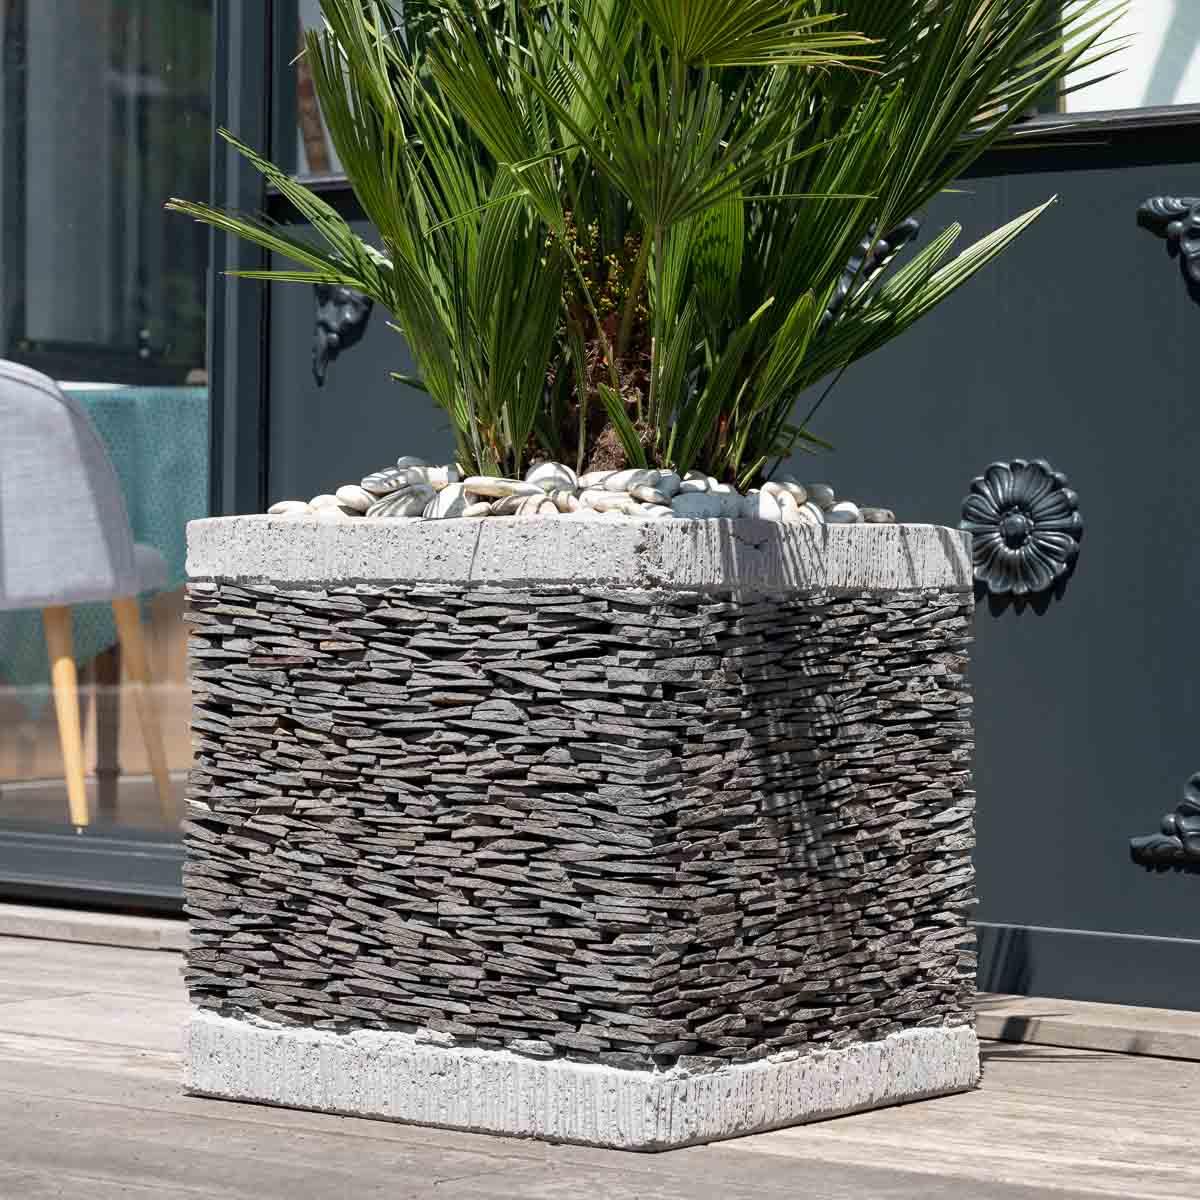 Wanda Collection Pot bac jardinière carré ardoise 50cm jardin terrasse pierre naturelle